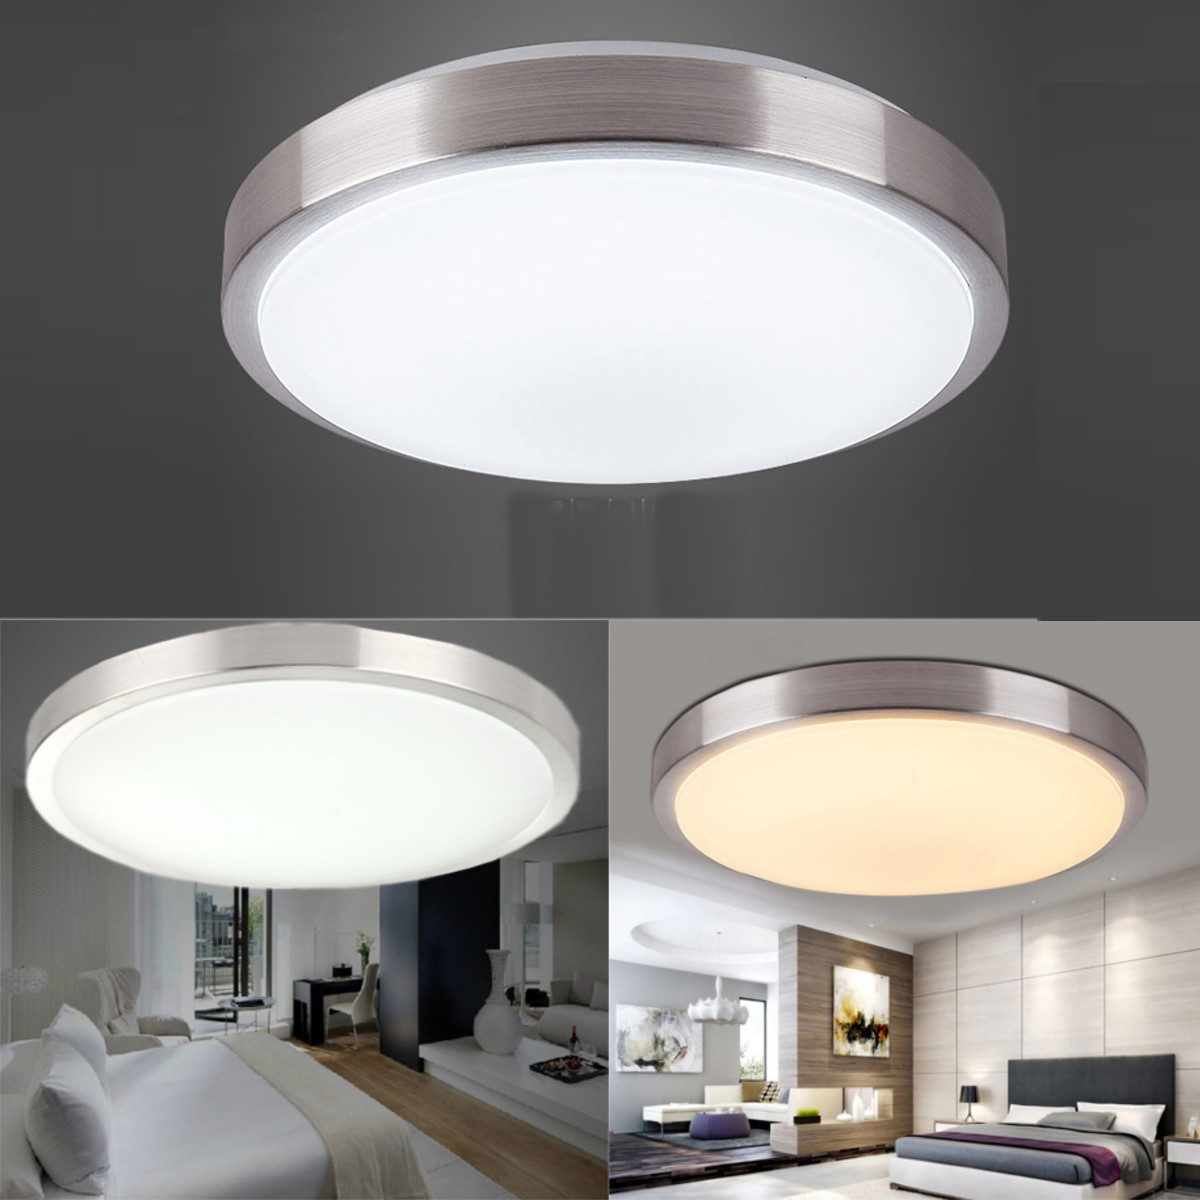 Asewin LED Ceiling Lights,Modern LED Ultraslim Ceiling Down Light ...